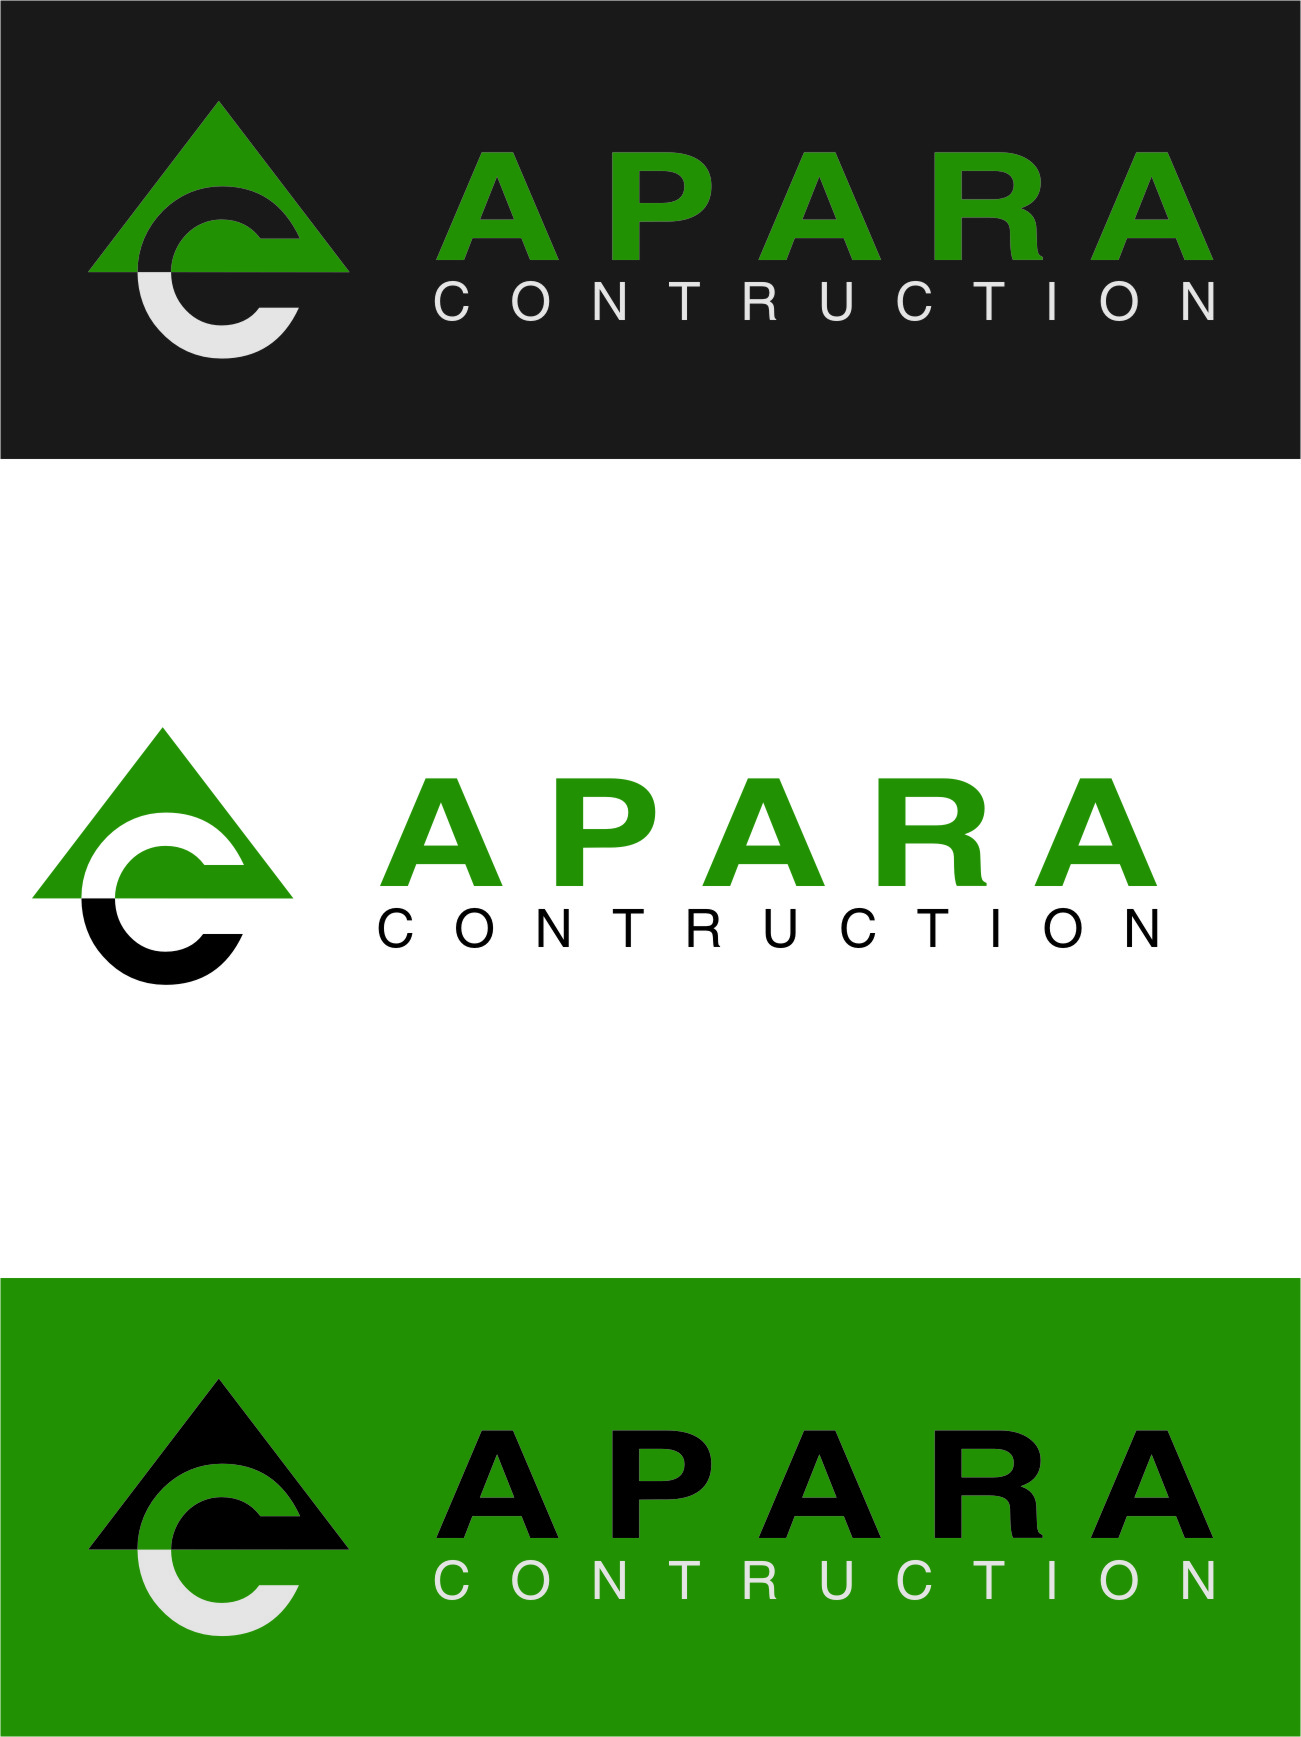 Logo Design by RasYa Muhammad Athaya - Entry No. 197 in the Logo Design Contest Apara Construction Logo Design.